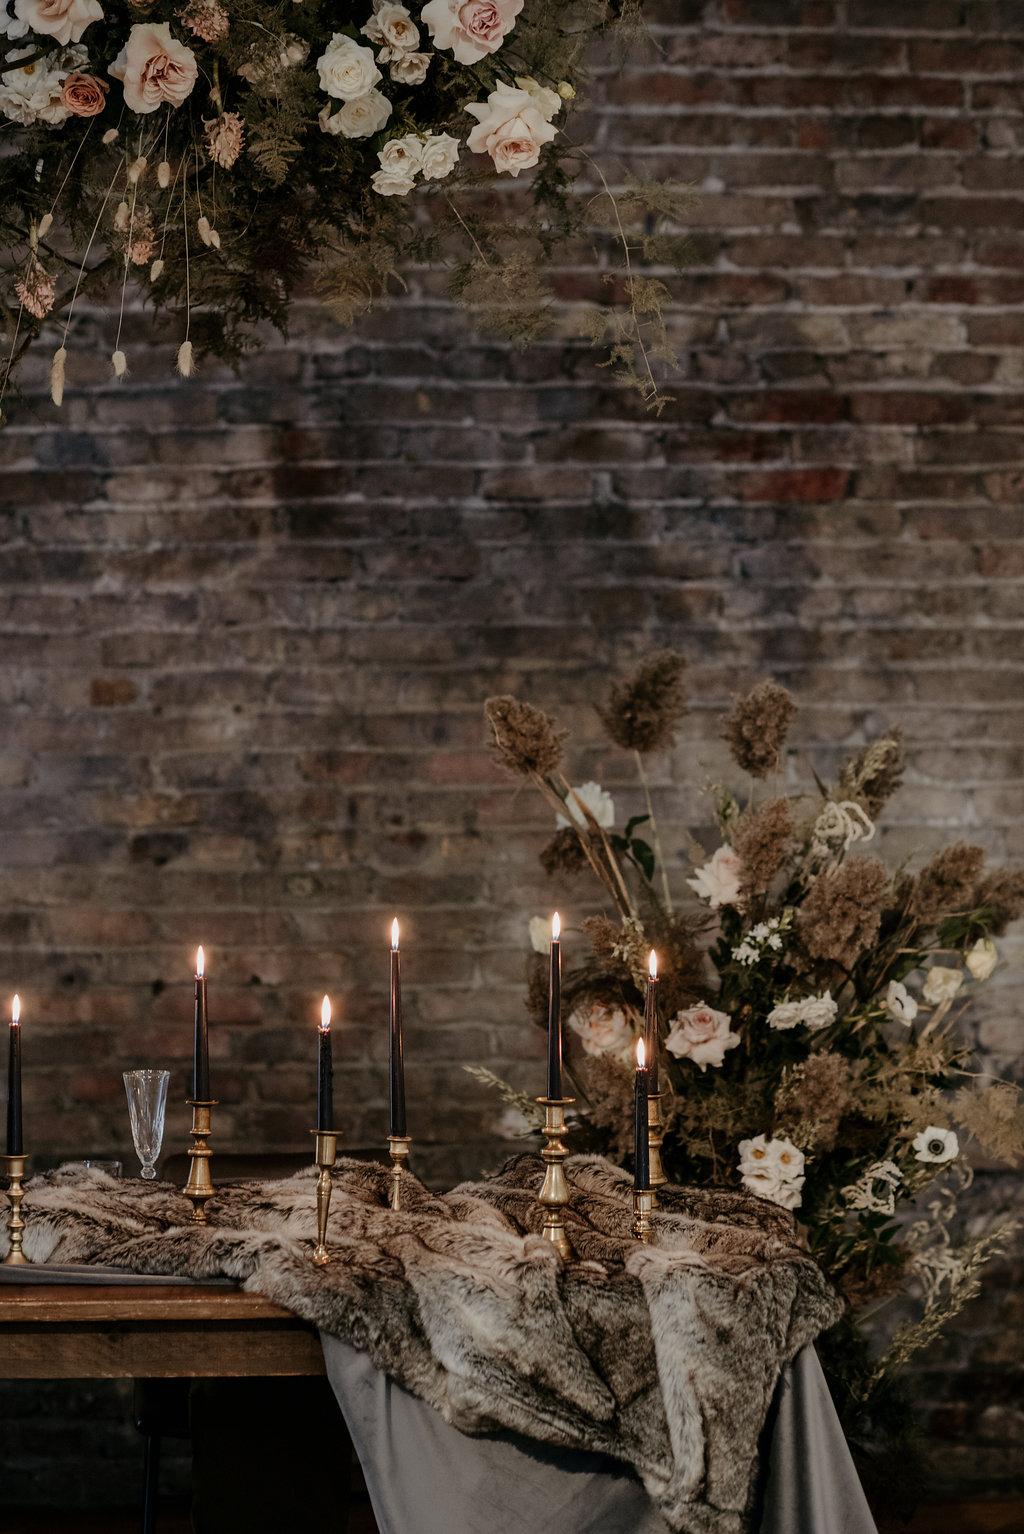 99 Sudbury, Barrie Wedding Planner, Wedding Designer, Elopement, Wedding Planner, Toronto Wedding Planner, Floral Backdrop, Romantic Elopement, Velvet Wedding Design, Fur Wedding Design, Black Taper Candles